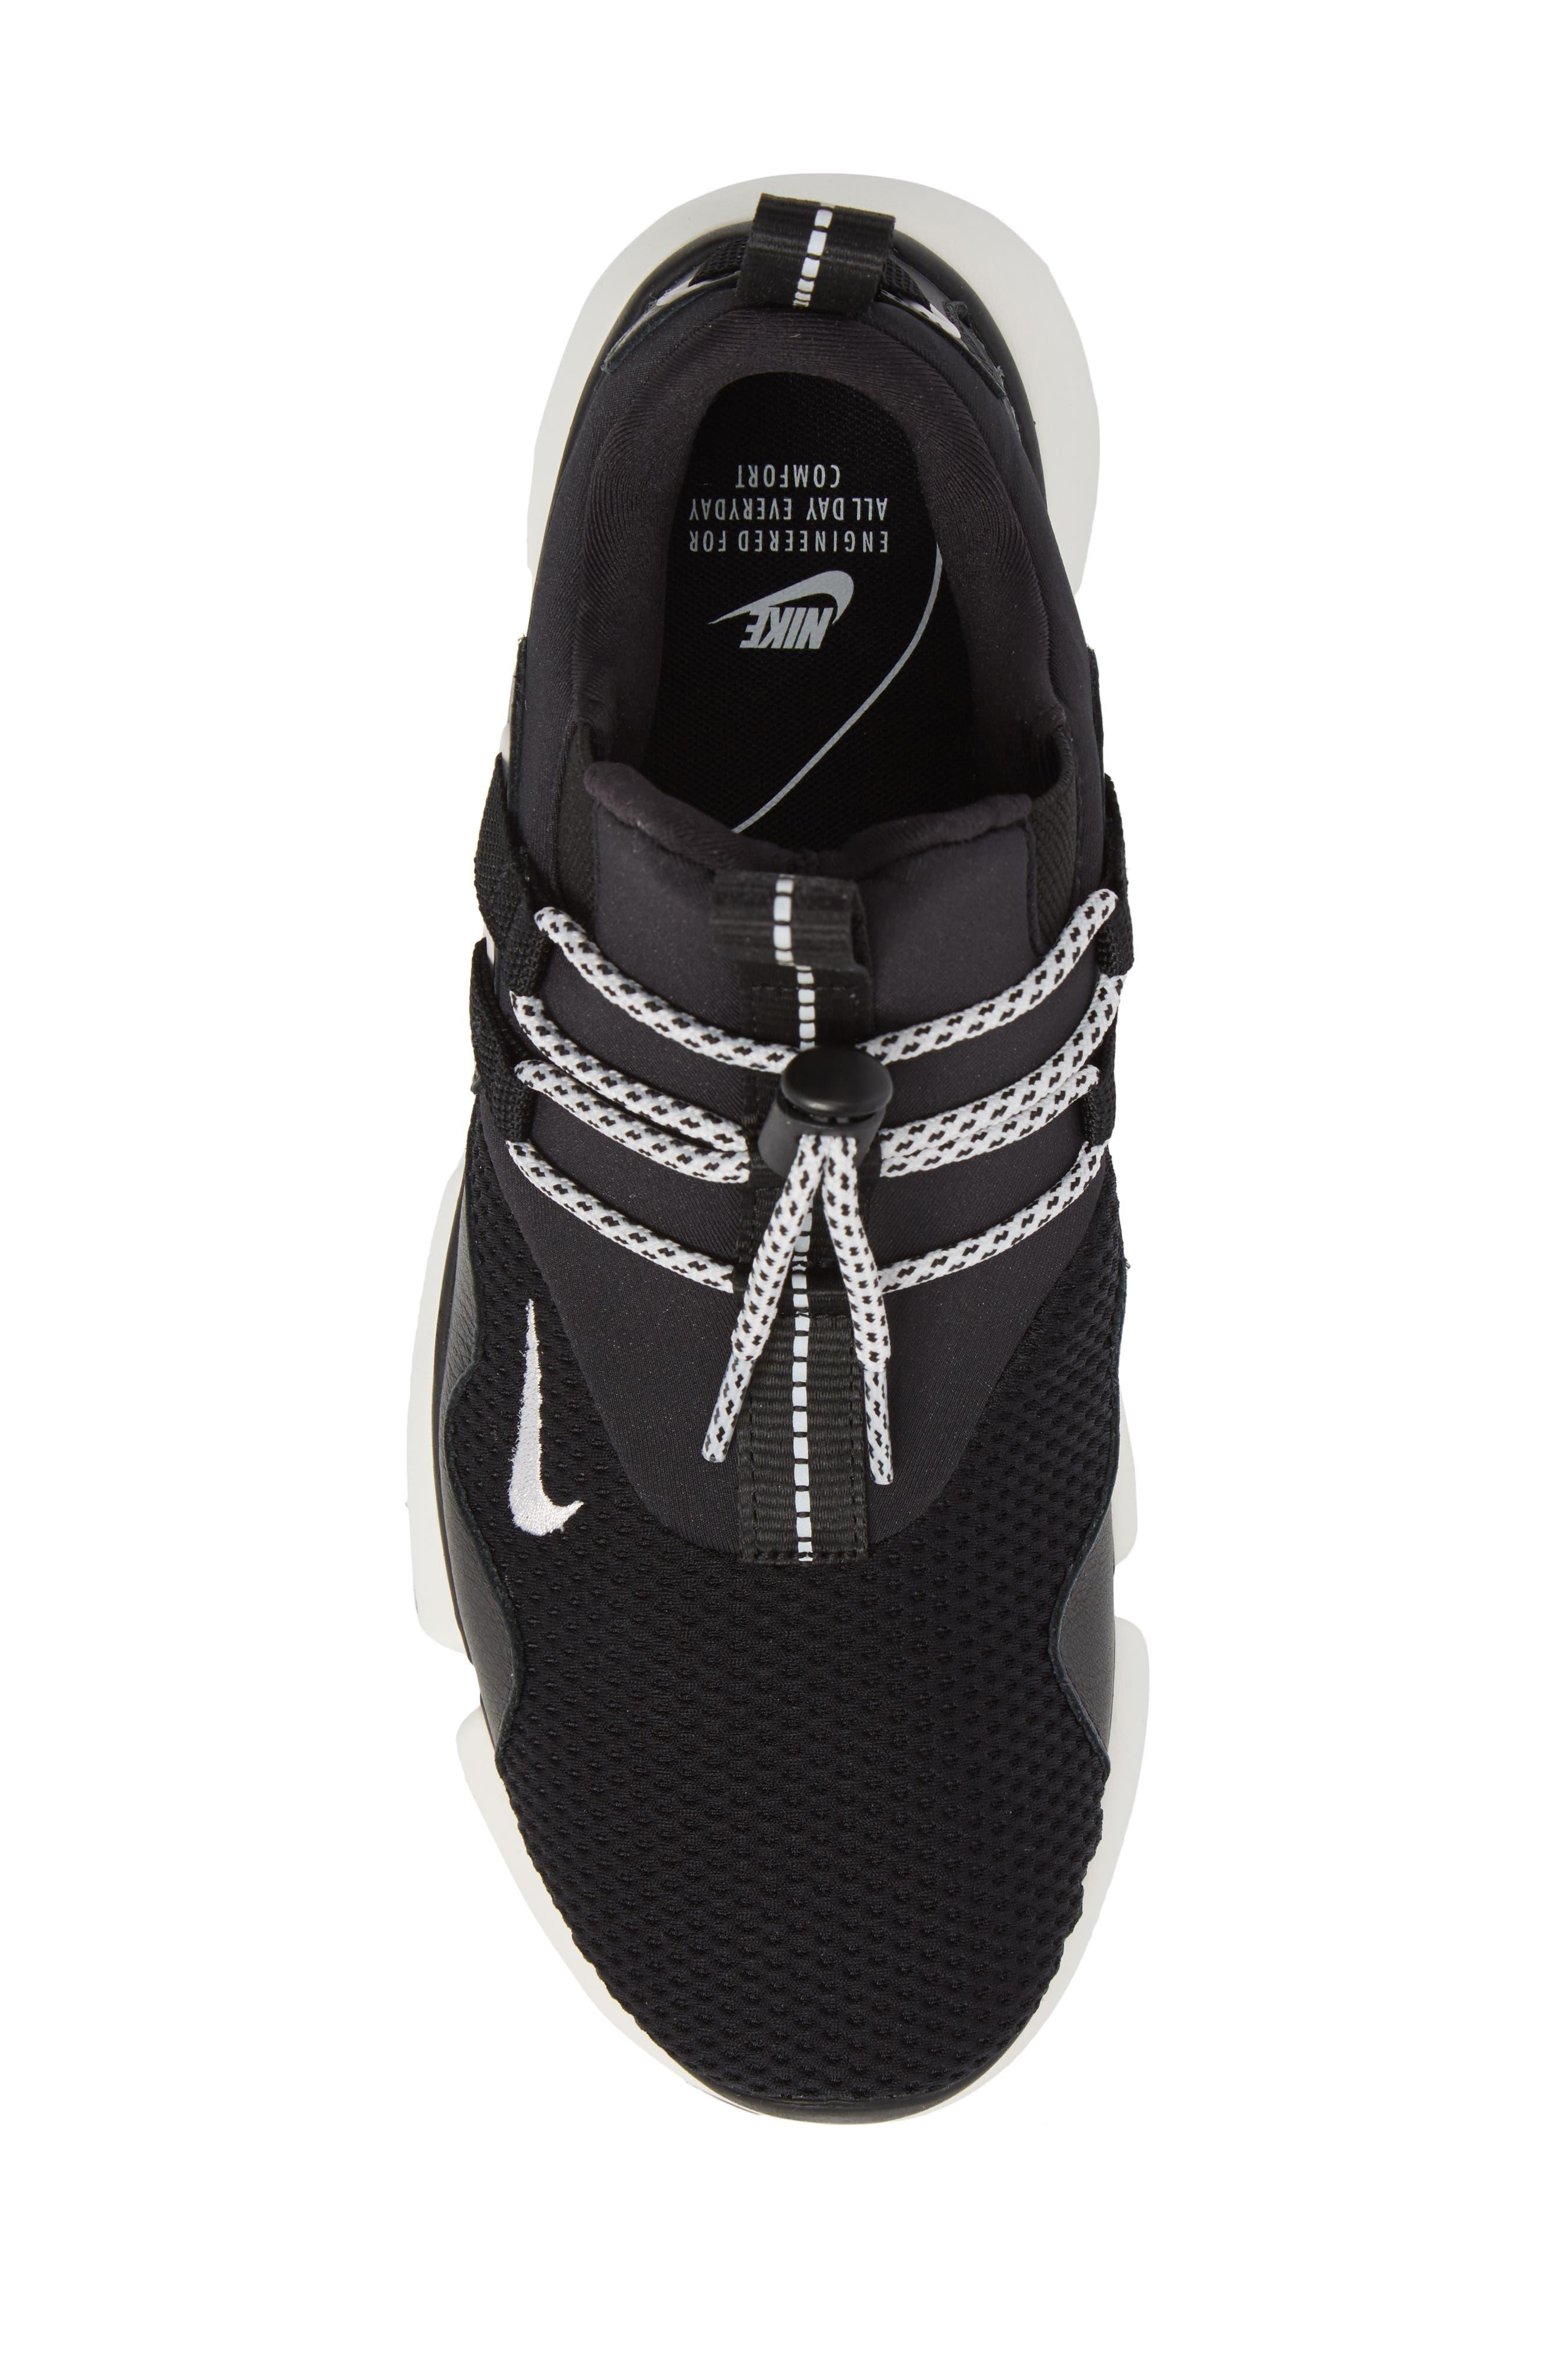 Pocket Knife DM Sneaker,                             Alternate thumbnail 5, color,                             Black/ Vast Grey/ Sail